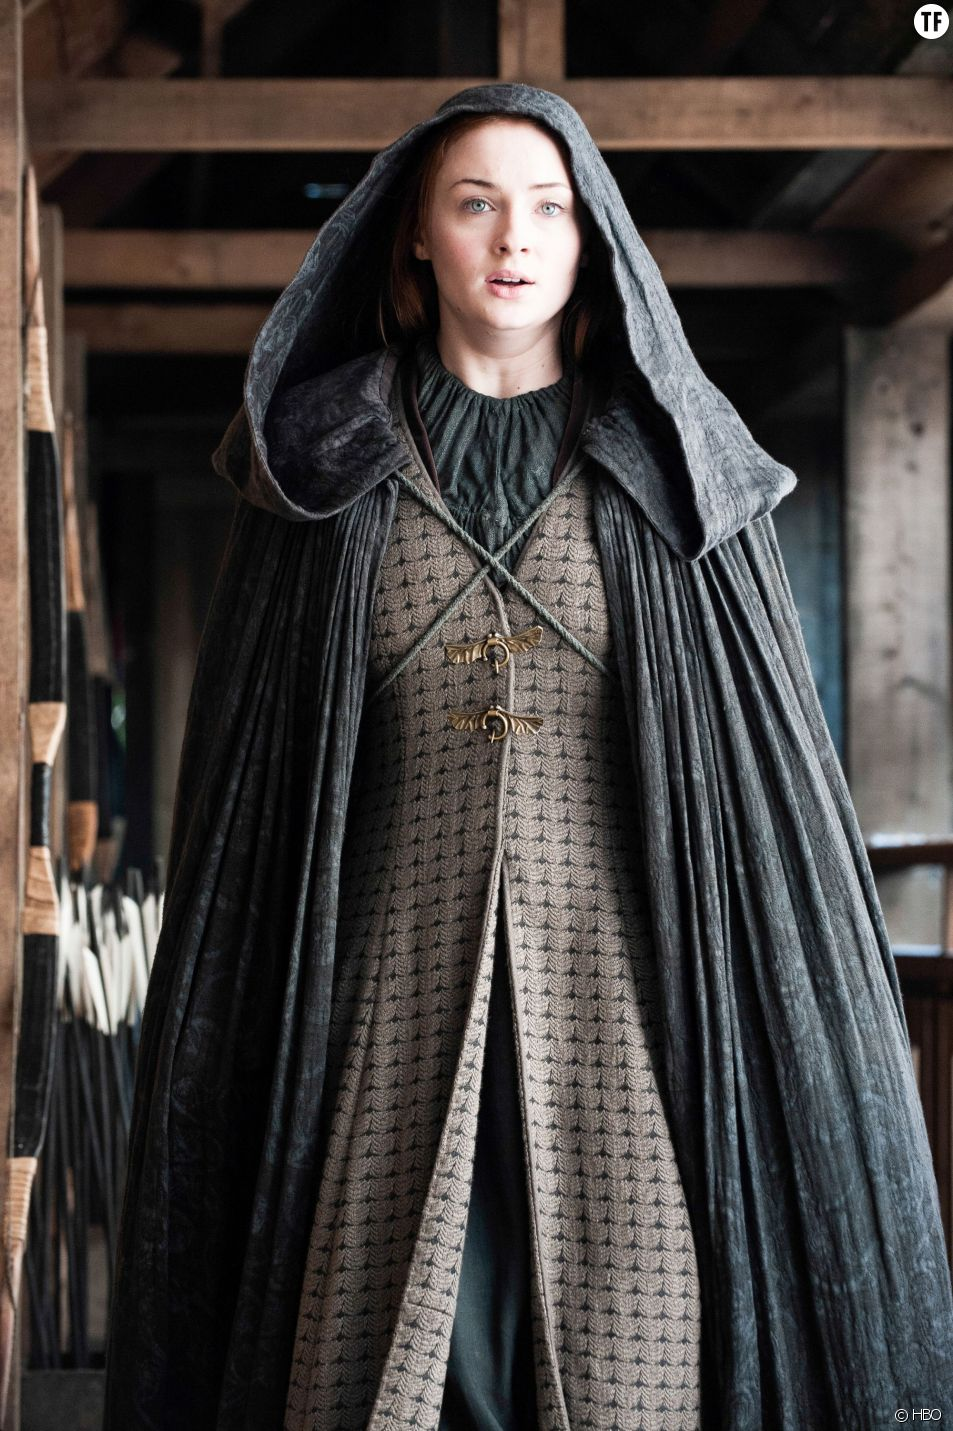 Streaming Grey's Anatomy Saison 15 Episode 9 : streaming, grey's, anatomy, saison, episode, Thrones, L'pisode, (season, Finale)